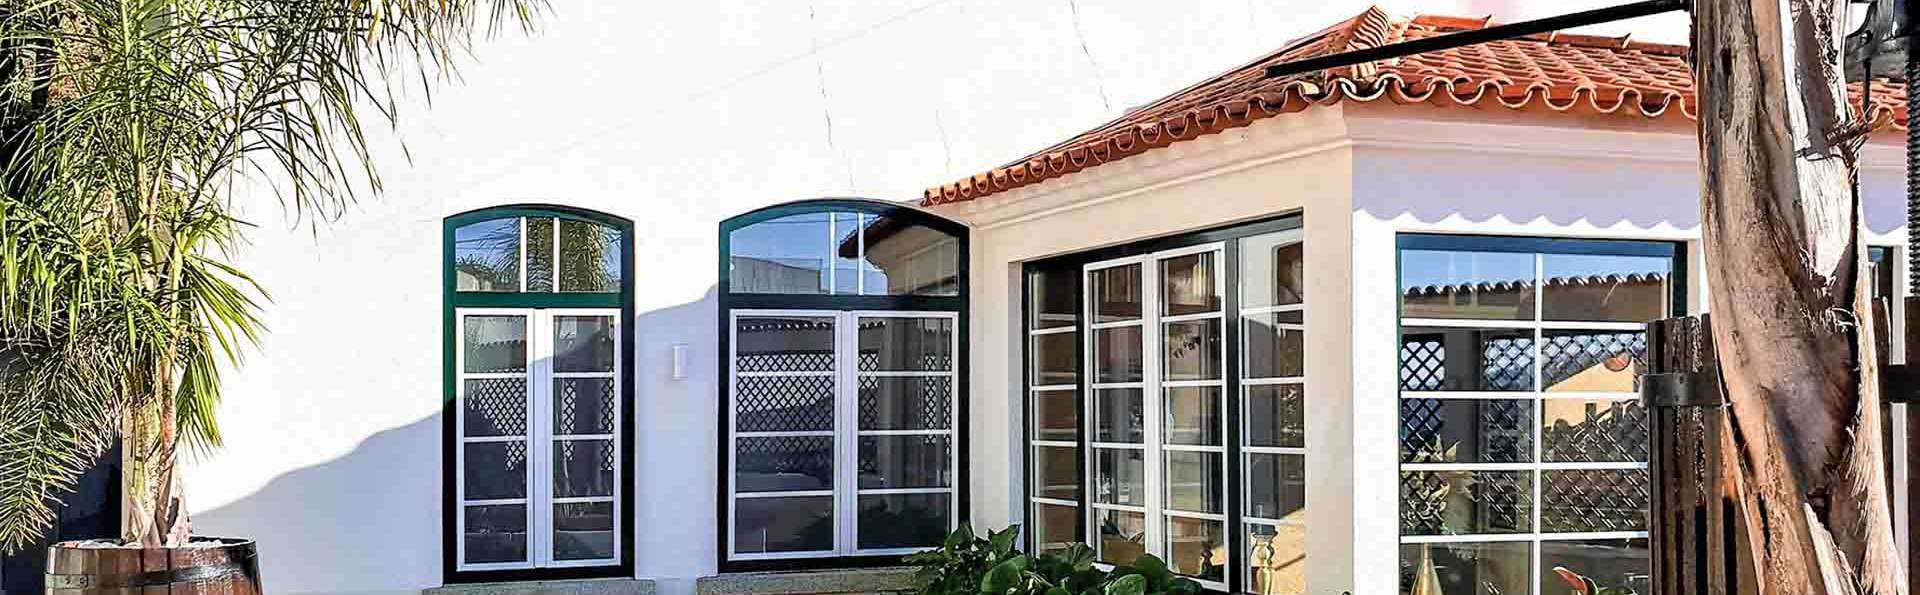 Quinta da Palmeira Country House Retrat & Spa - EDIT_EXTERIOR_03.jpg